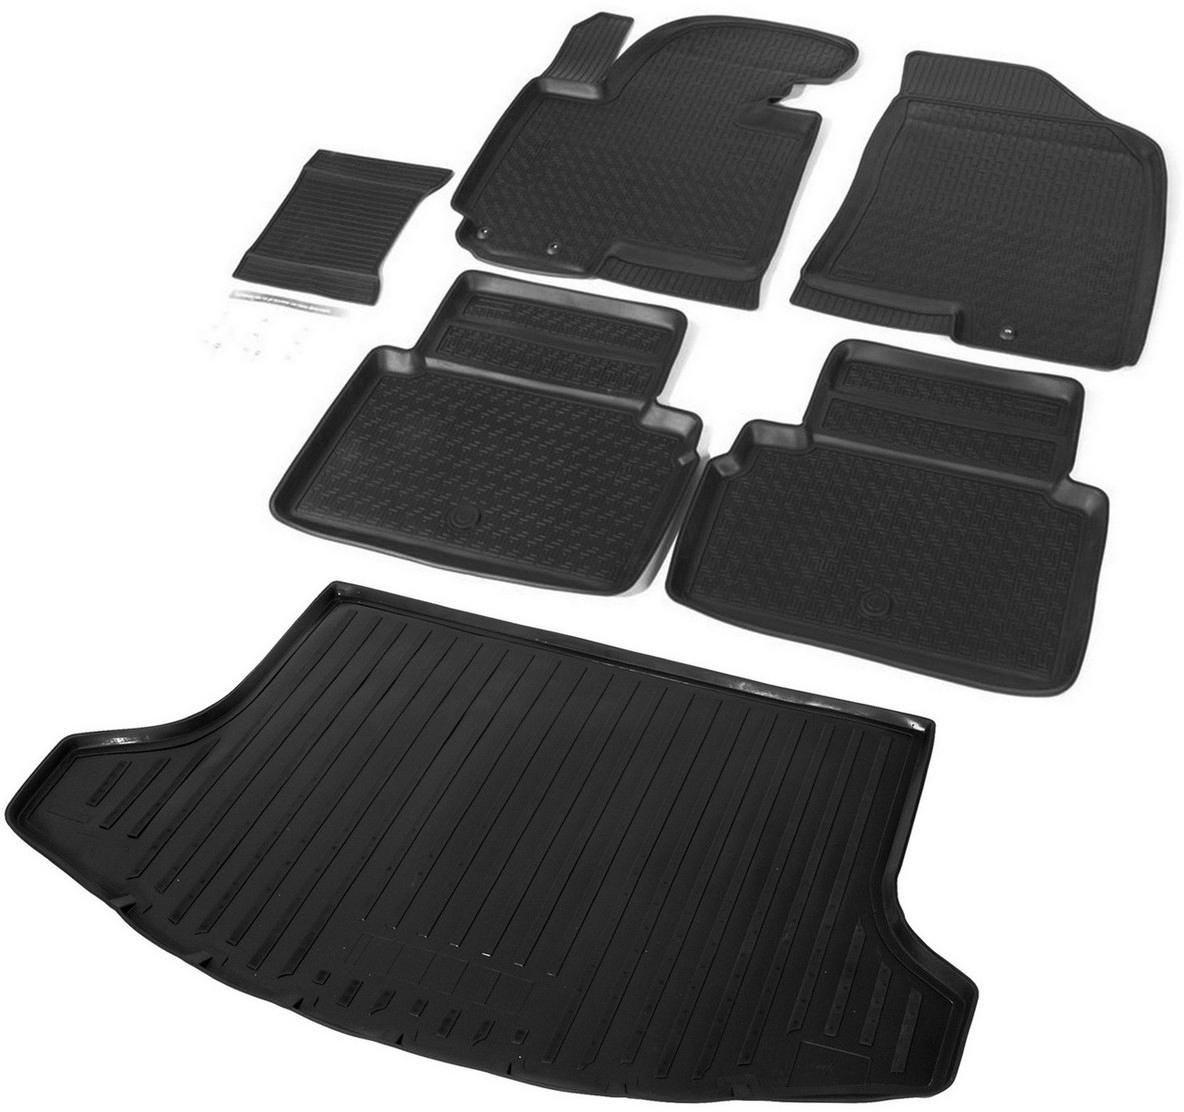 Купить Комплект ковриков салона и багажника Rival для Kia Sportage 2010-2016, полиуретан. K12805001-2